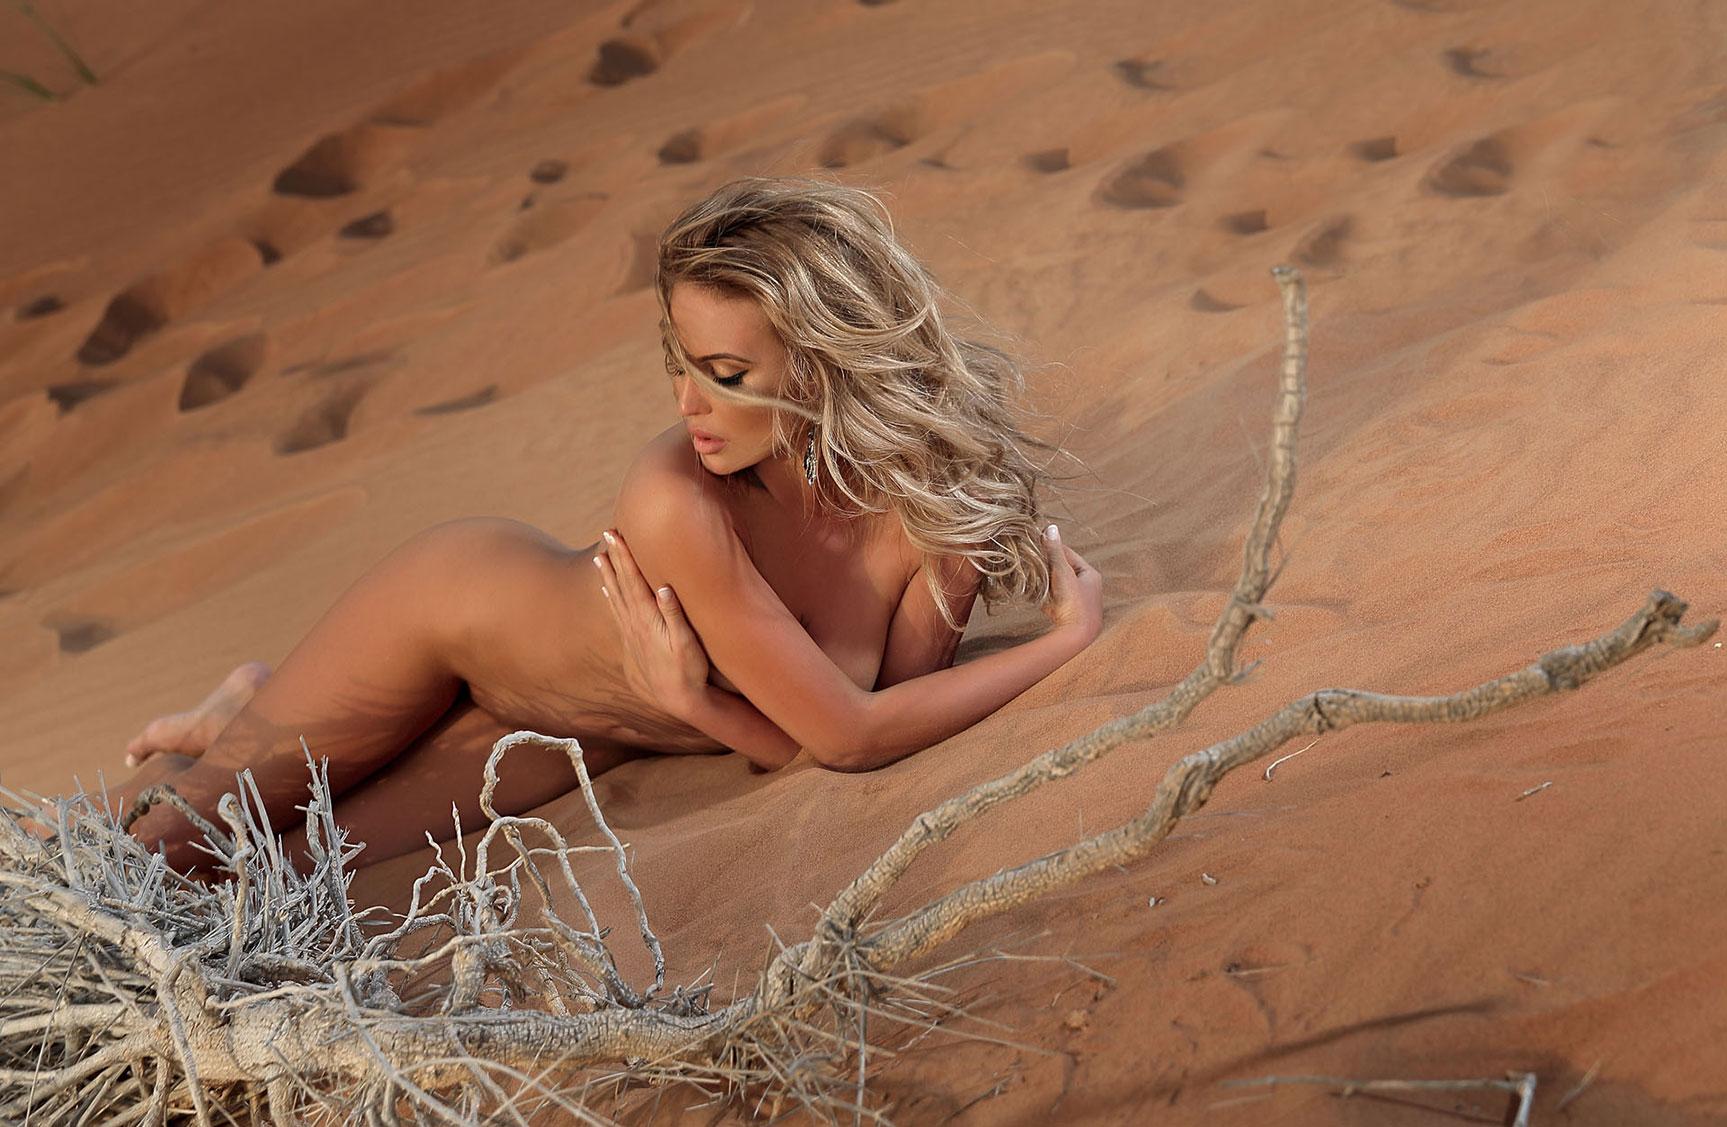 Alina Ilyina nude / Алина Ильина в журнале Playboy Украина, май 2014